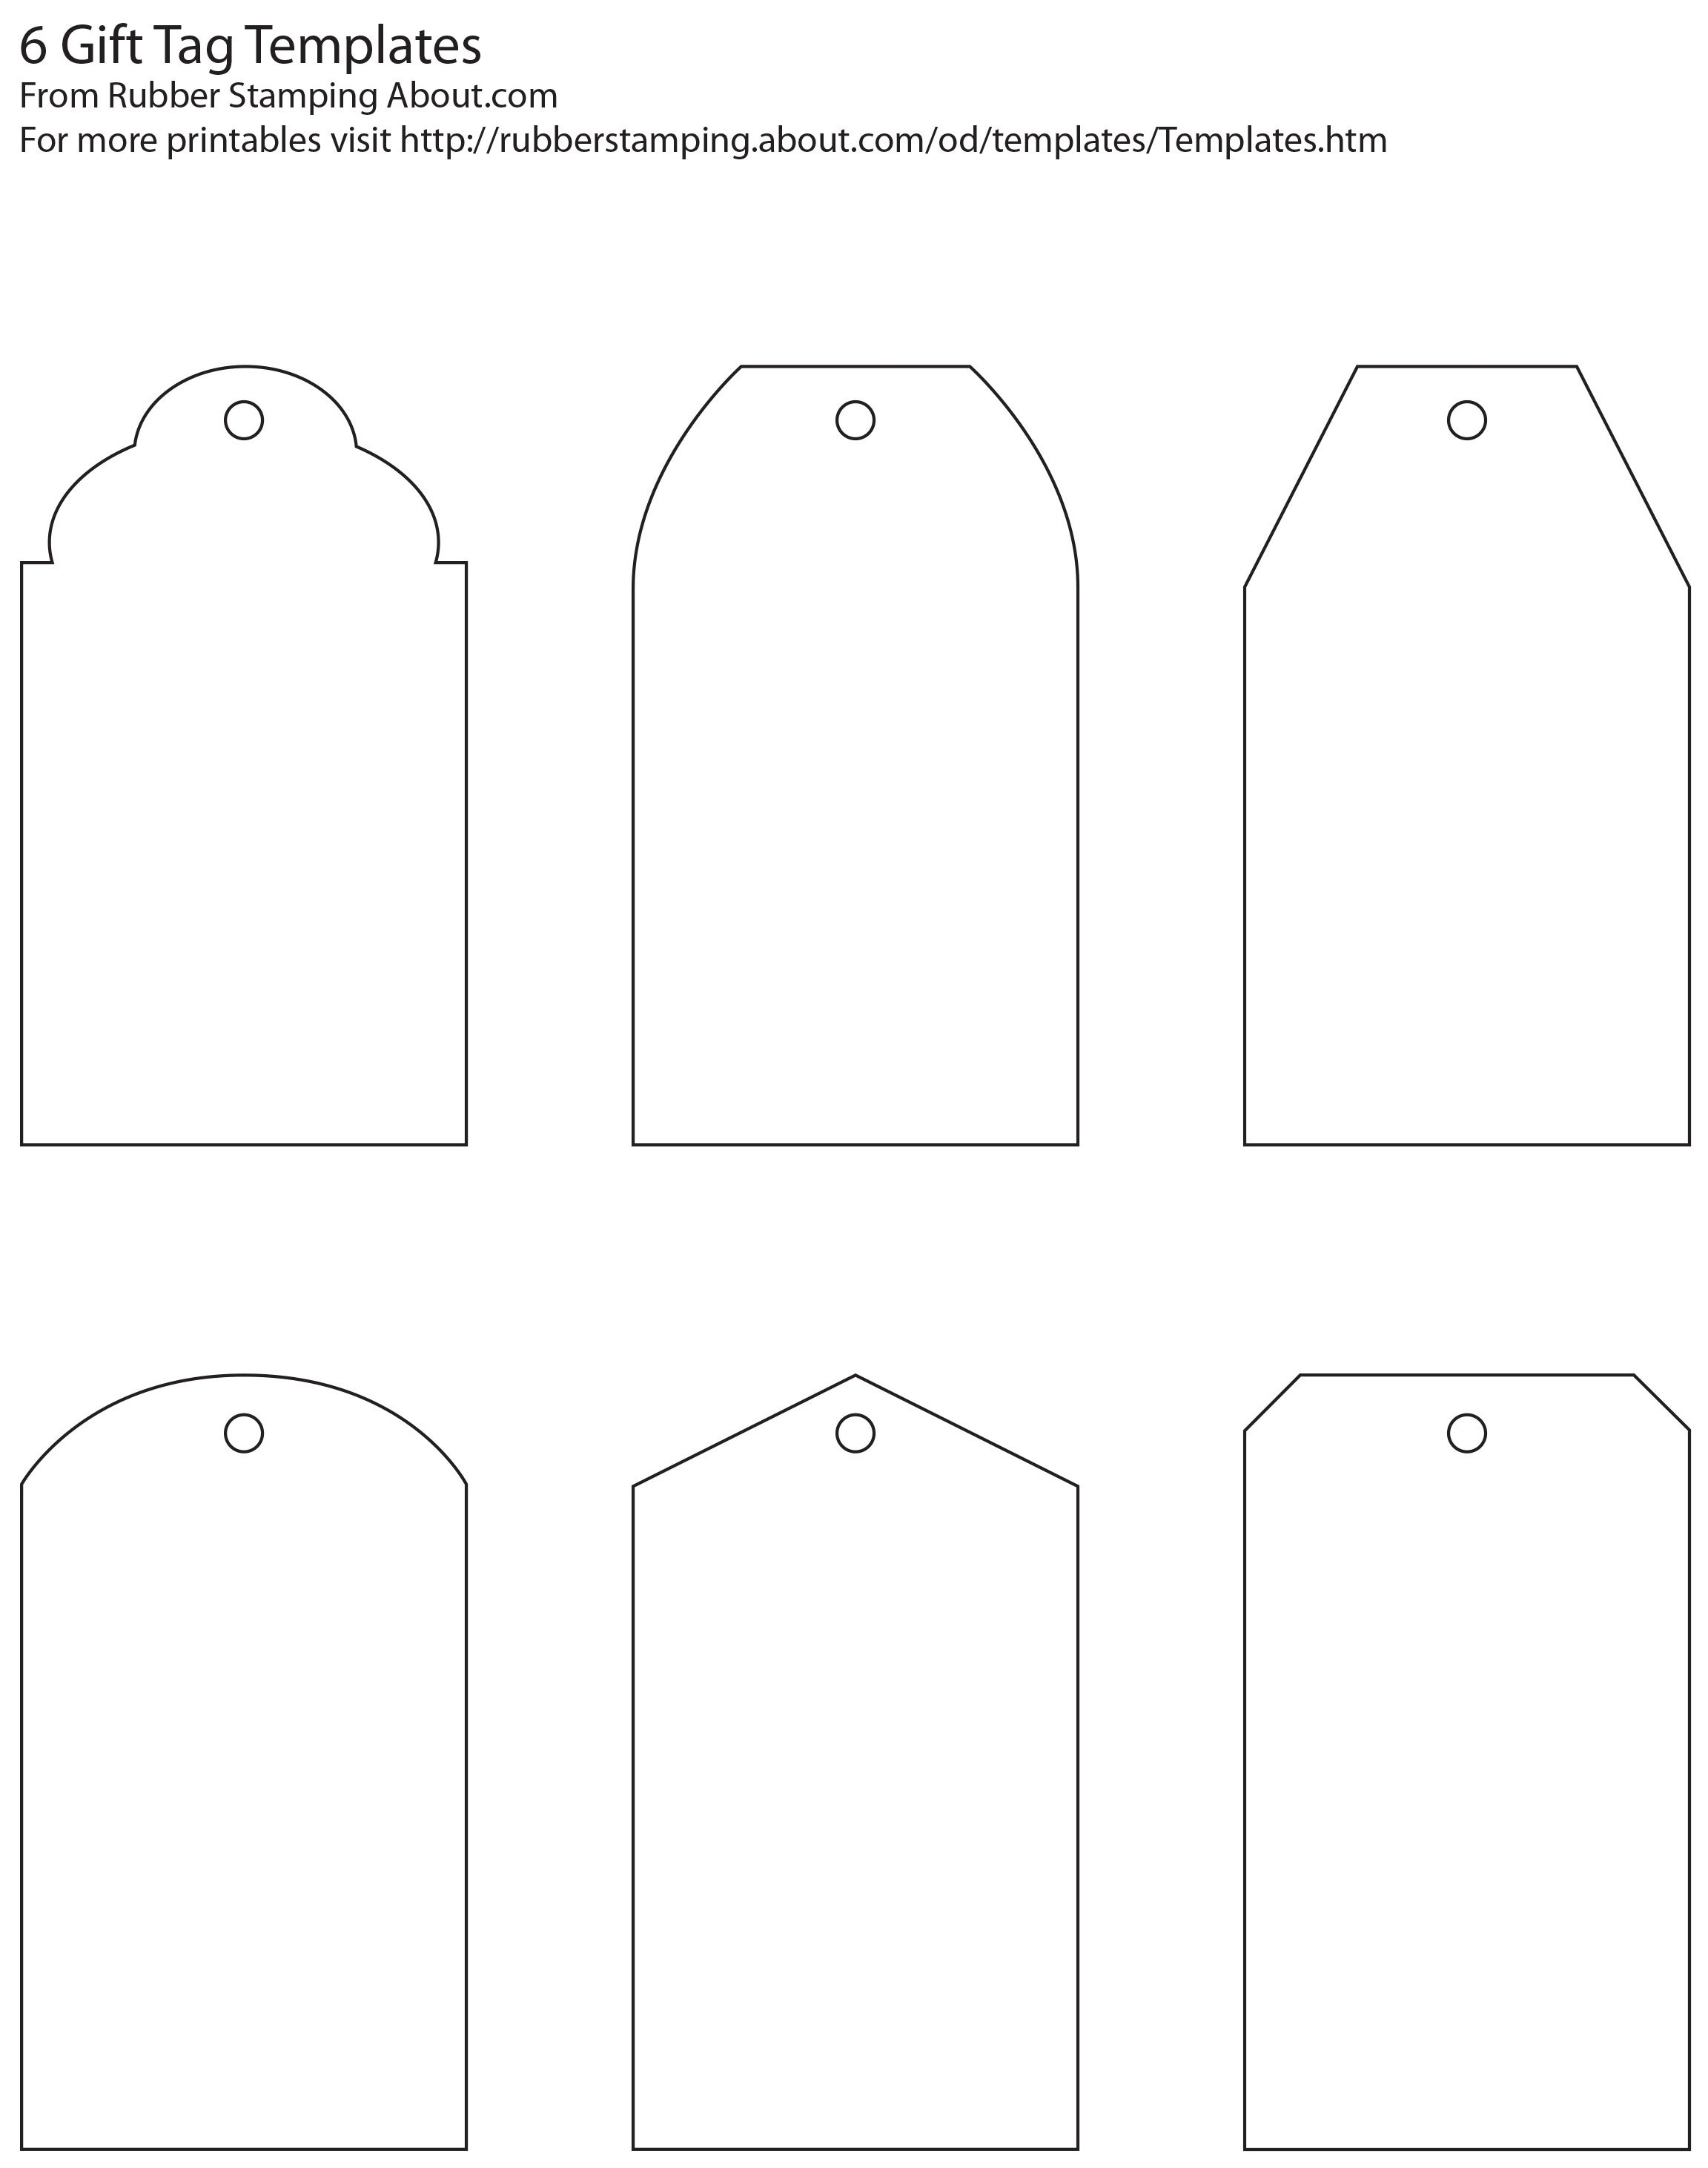 Free And Whimsical Printable Gift Tag Templates   Great Idea - Free Printable Gift Bag Tags